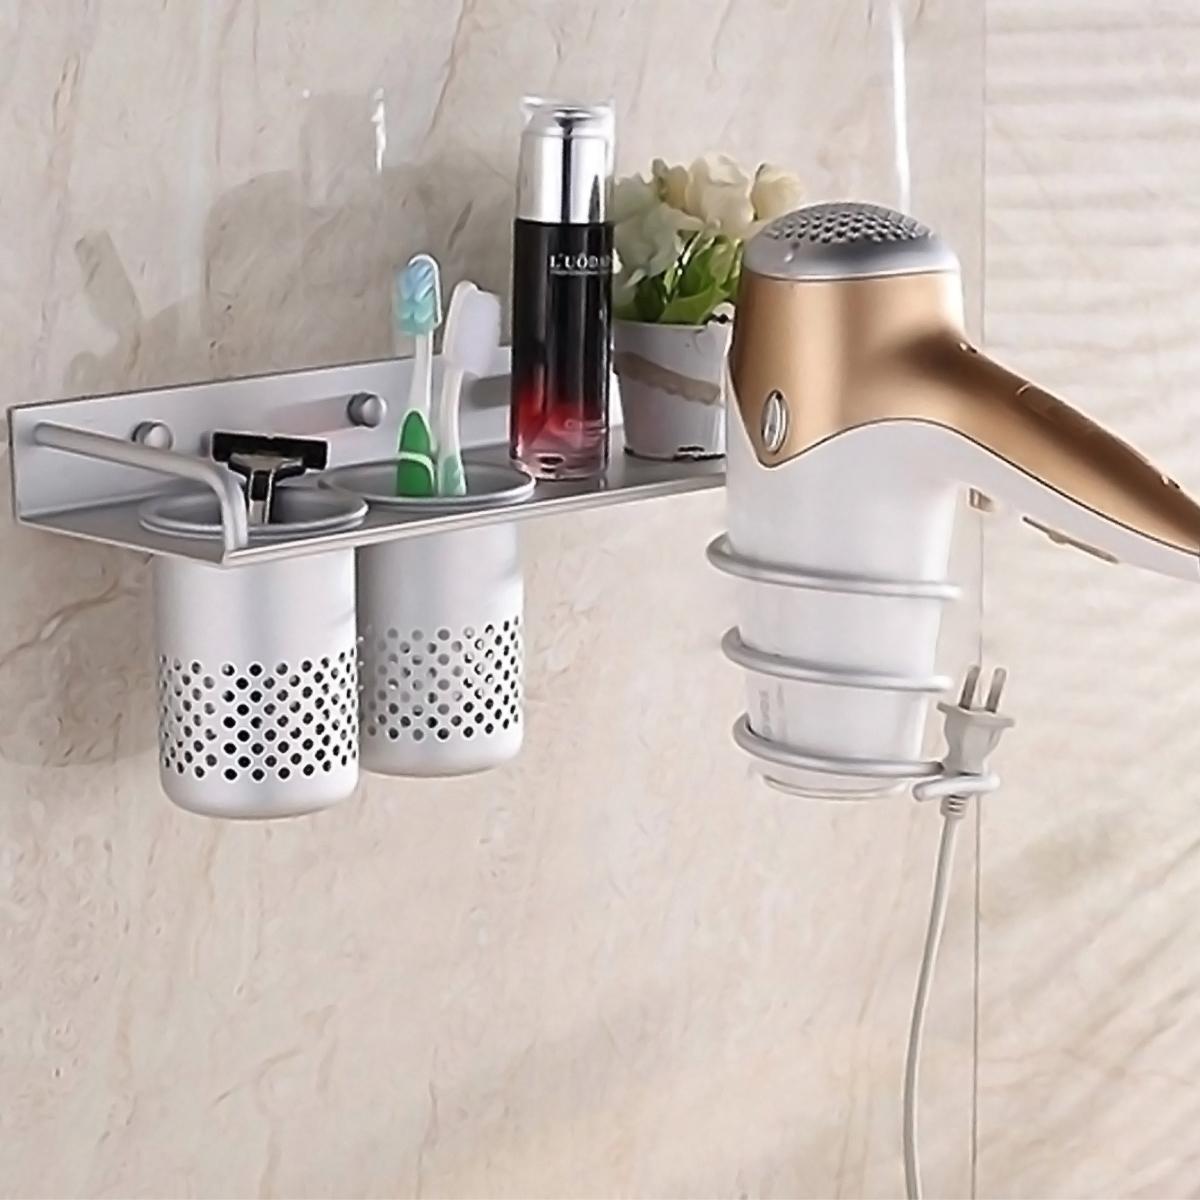 Bathroom Wall Organizer Of Multifunction Hair Dryer Stands Mounted Aluminum Shelf